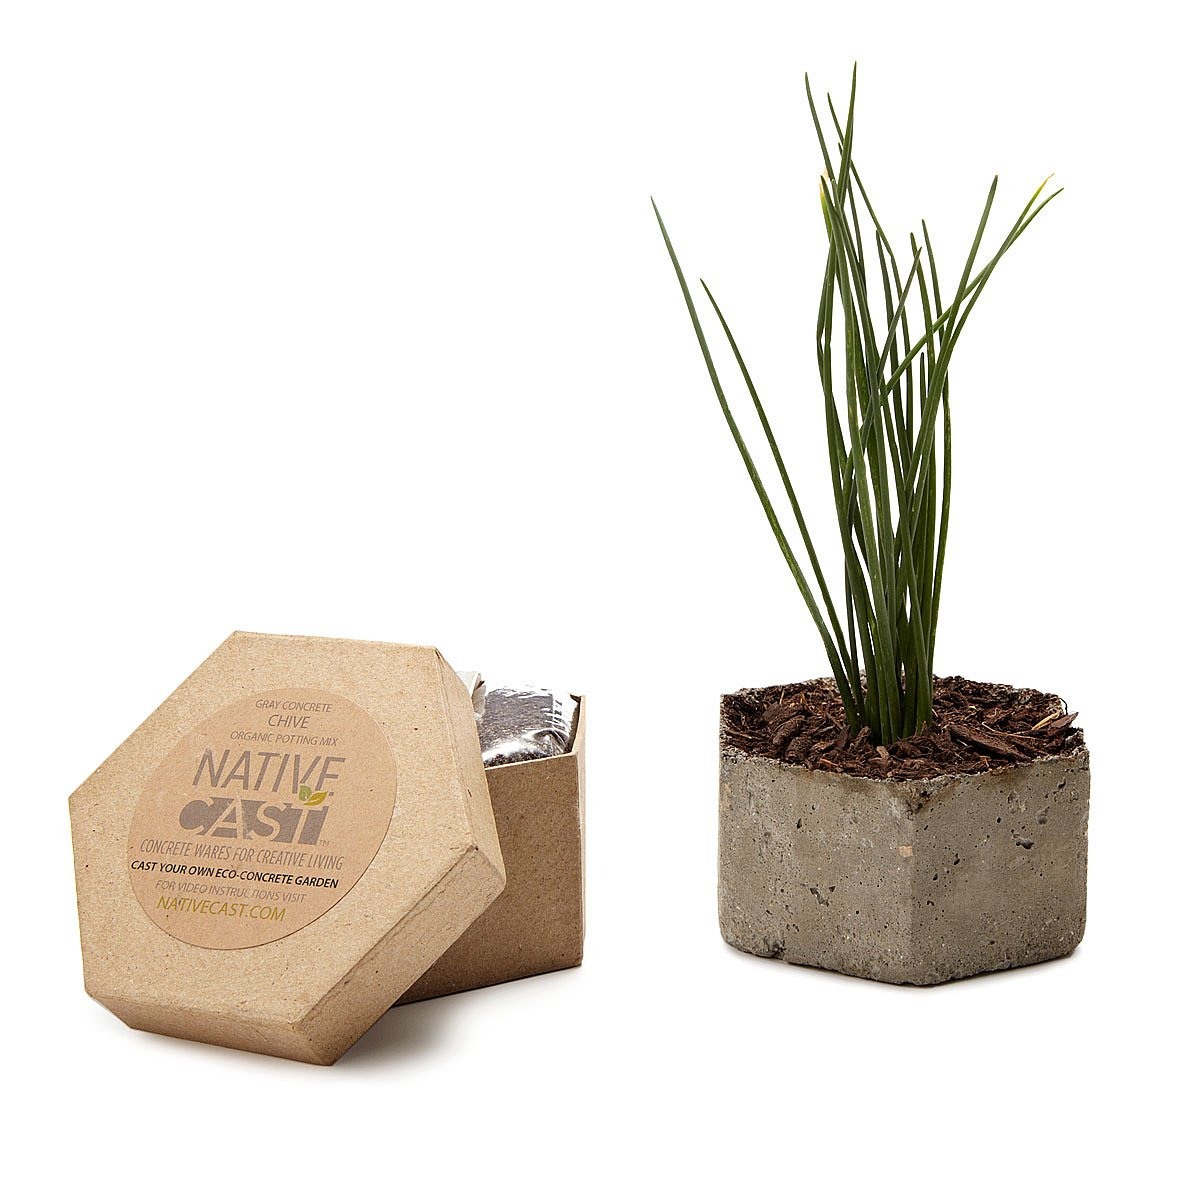 diy hexagonal chive planter kit 1 thumbnail